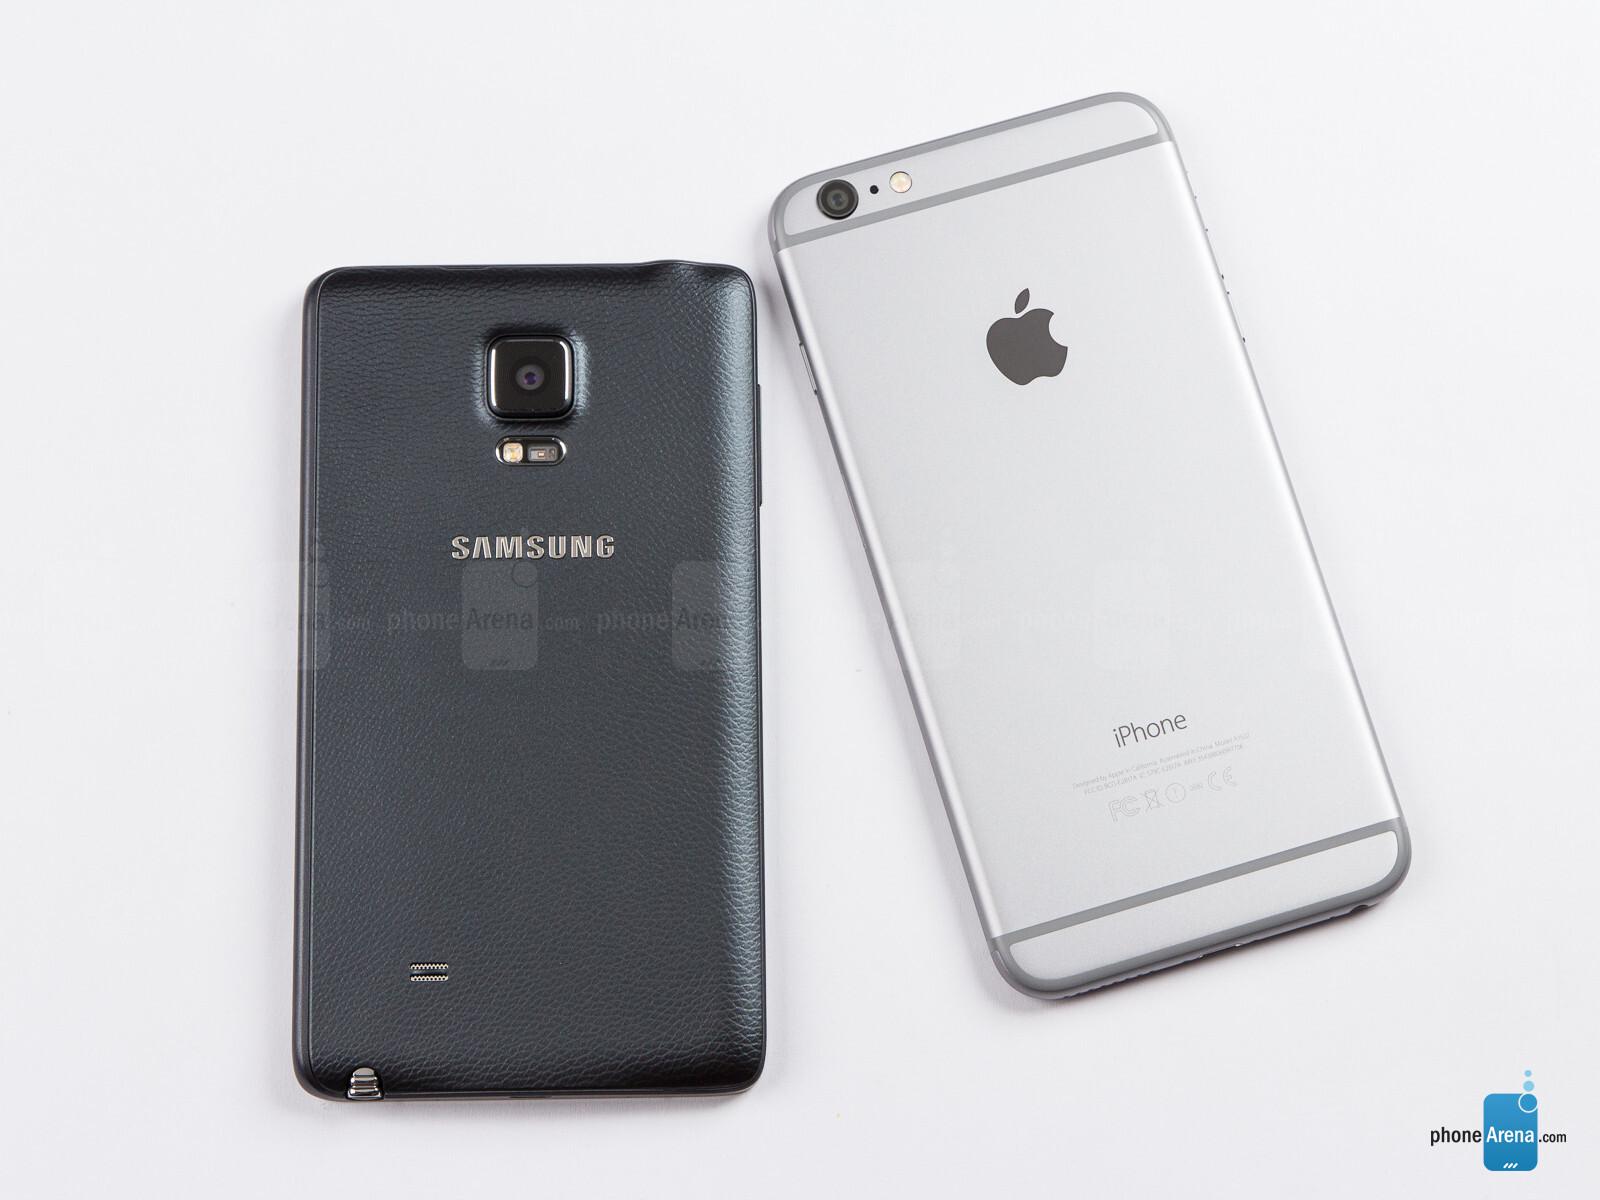 mobile spy iphone 6 Plus vs galaxy note 4